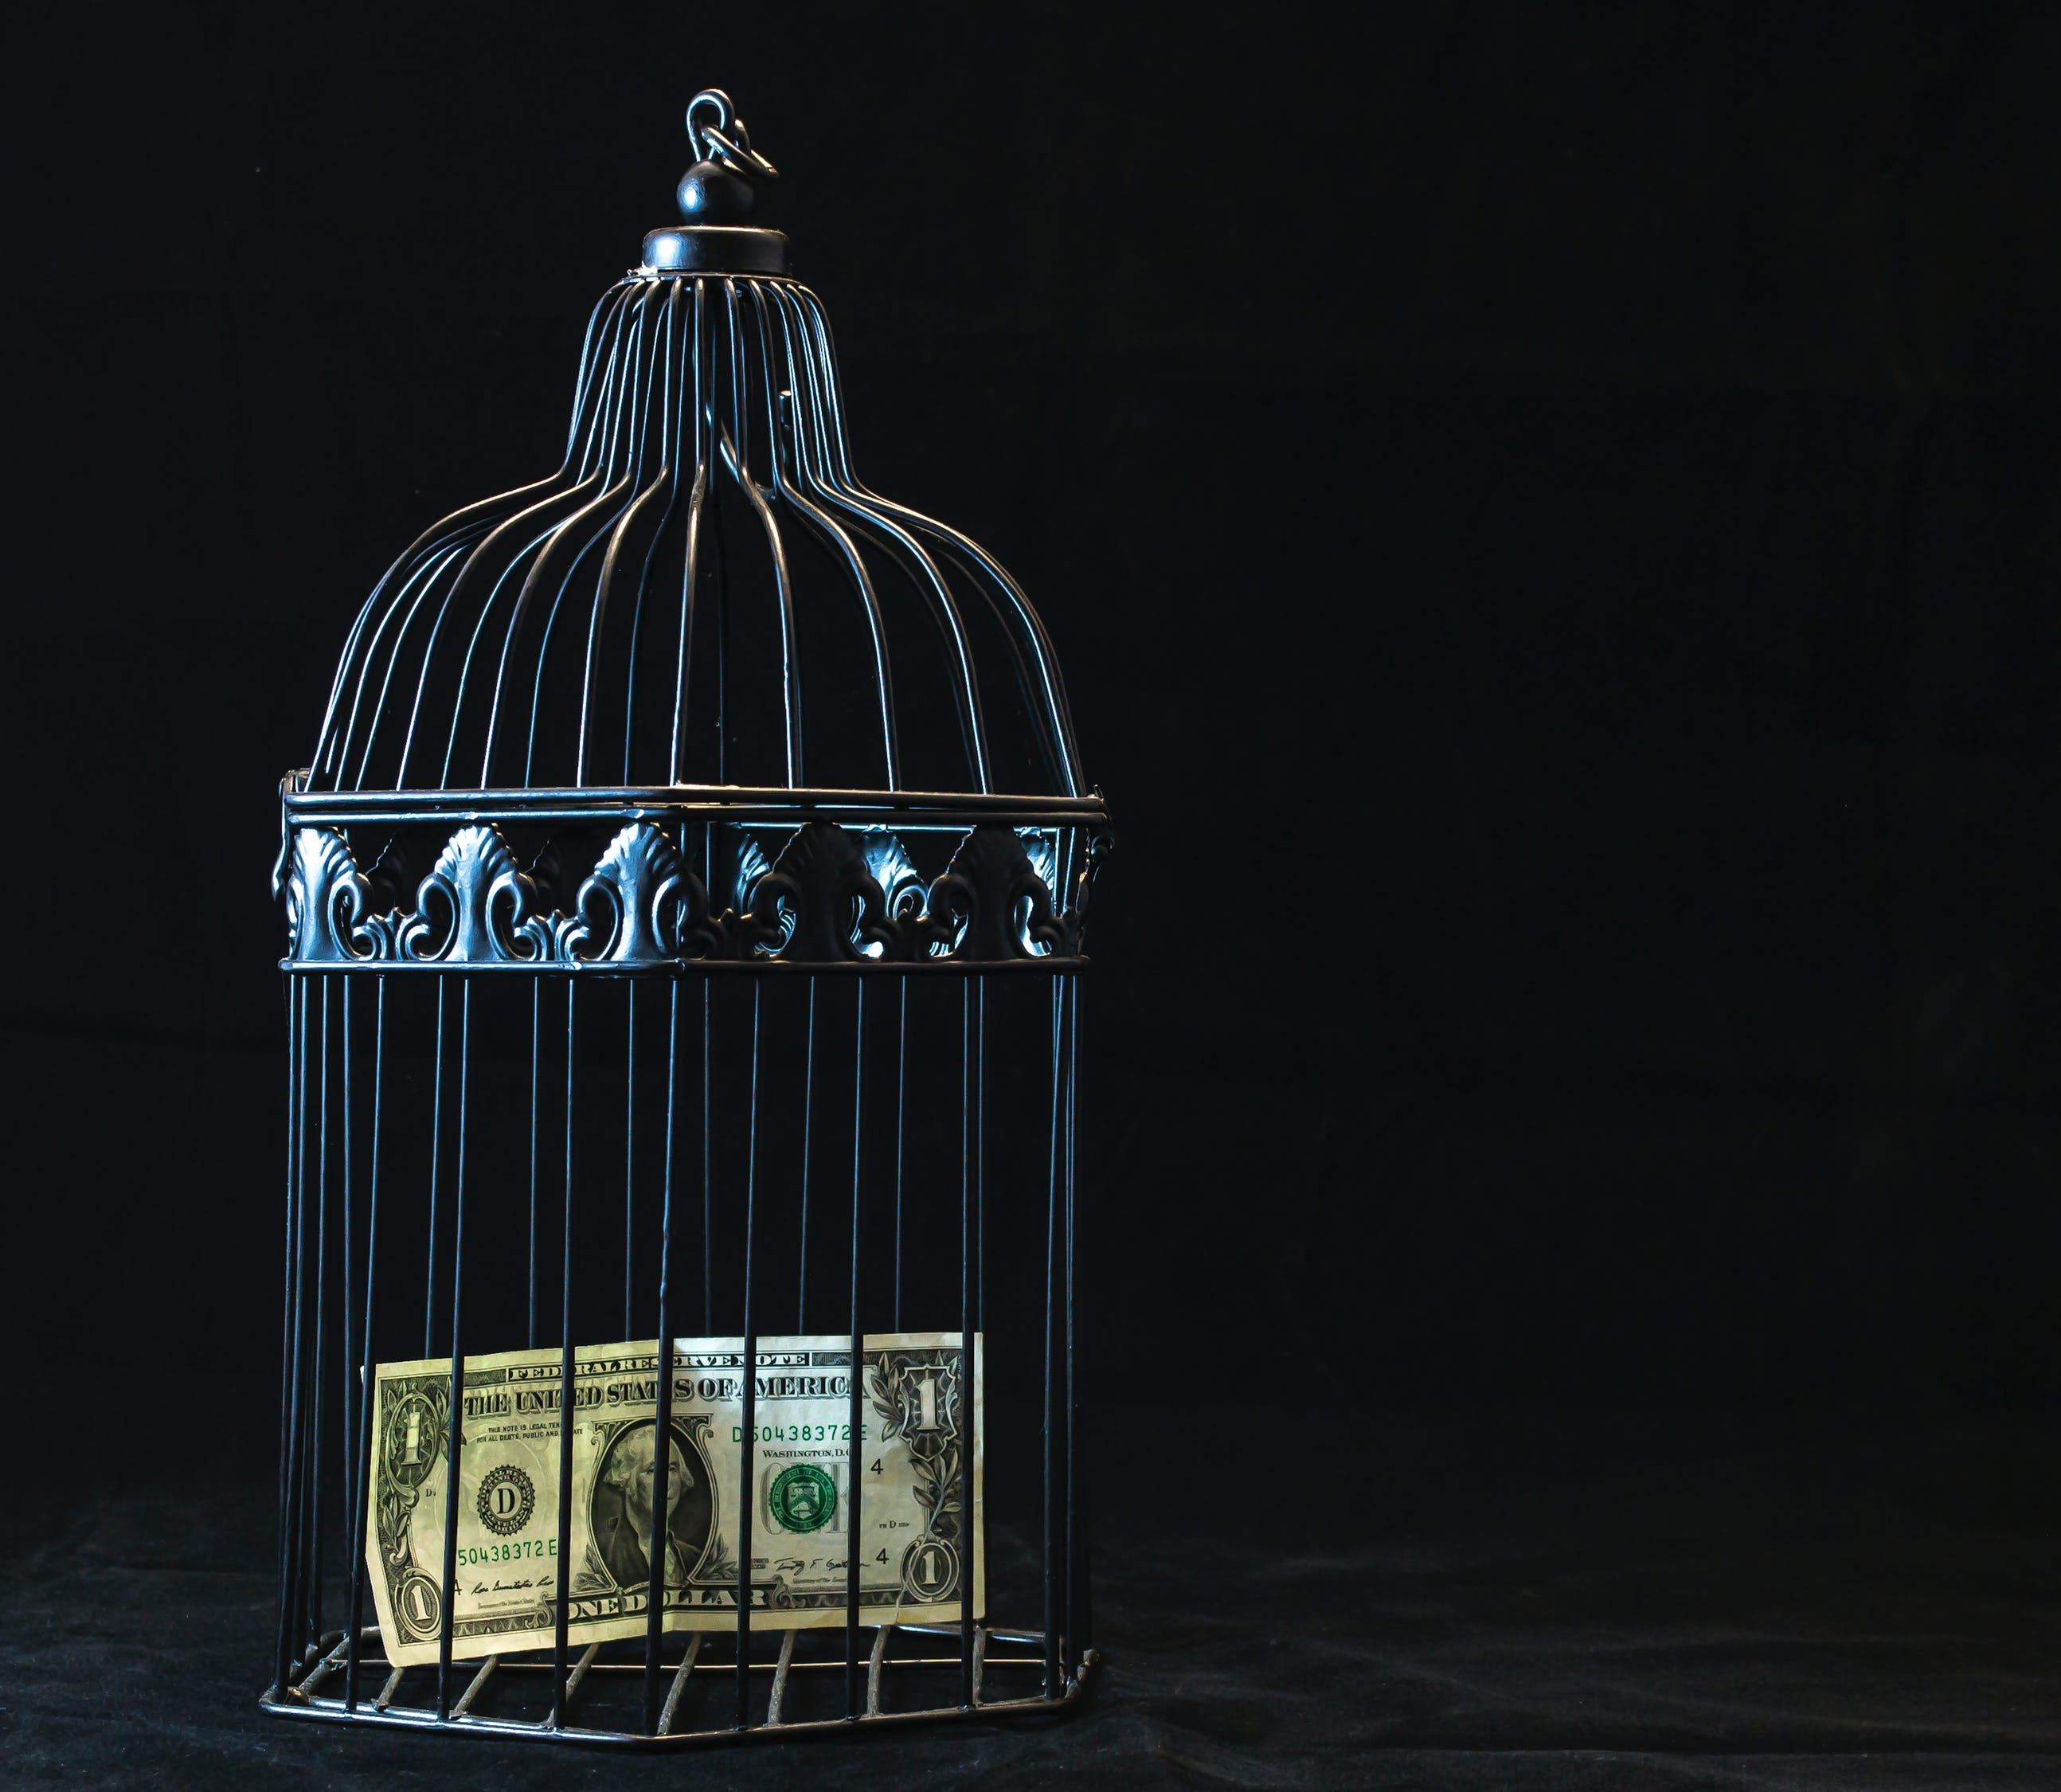 Caged Money